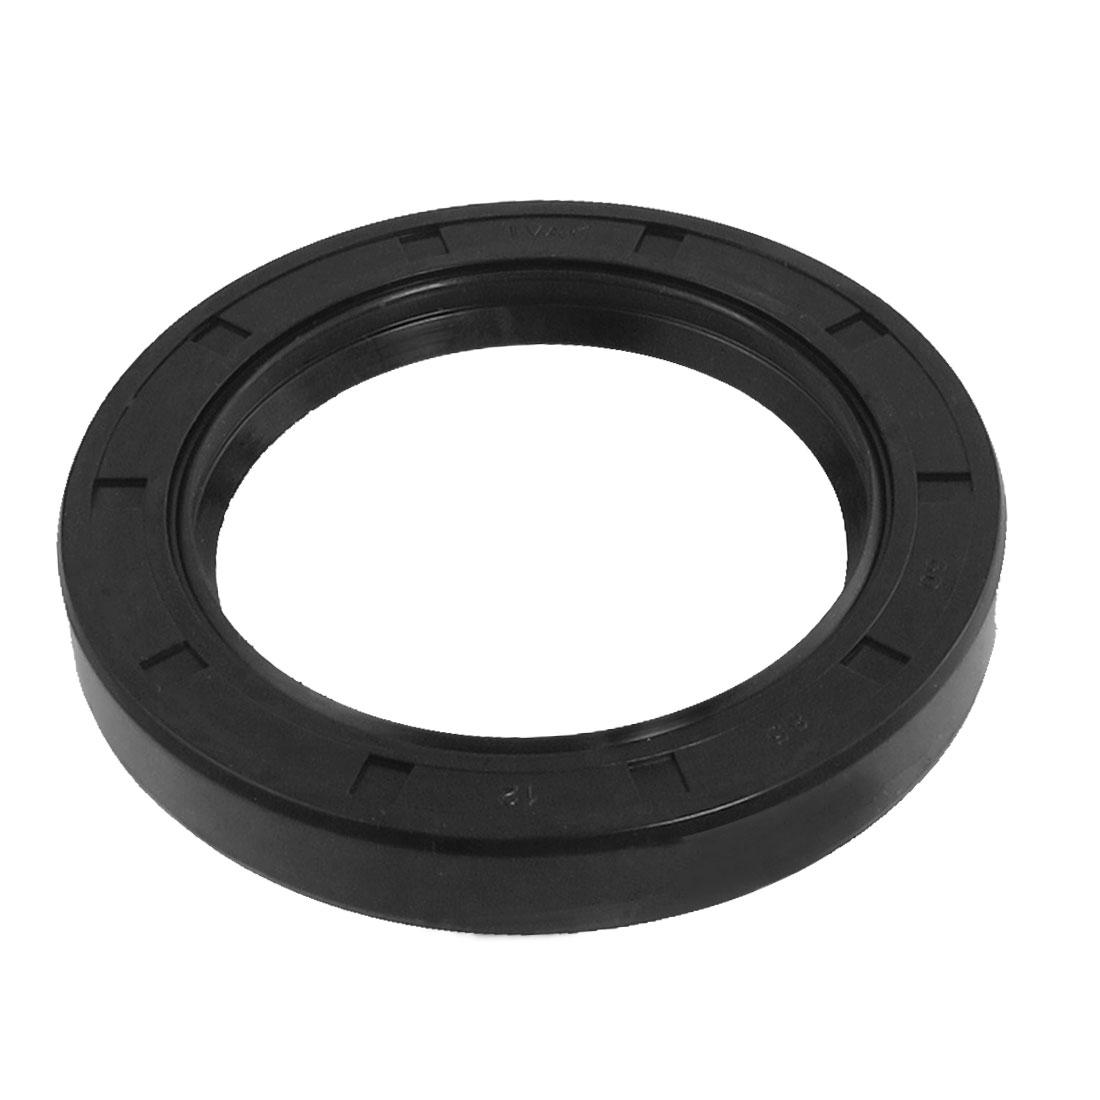 Black Nitrile Rubber Dual Lips Oil Shaft Seal TC 60mm x 85mm x 12mm